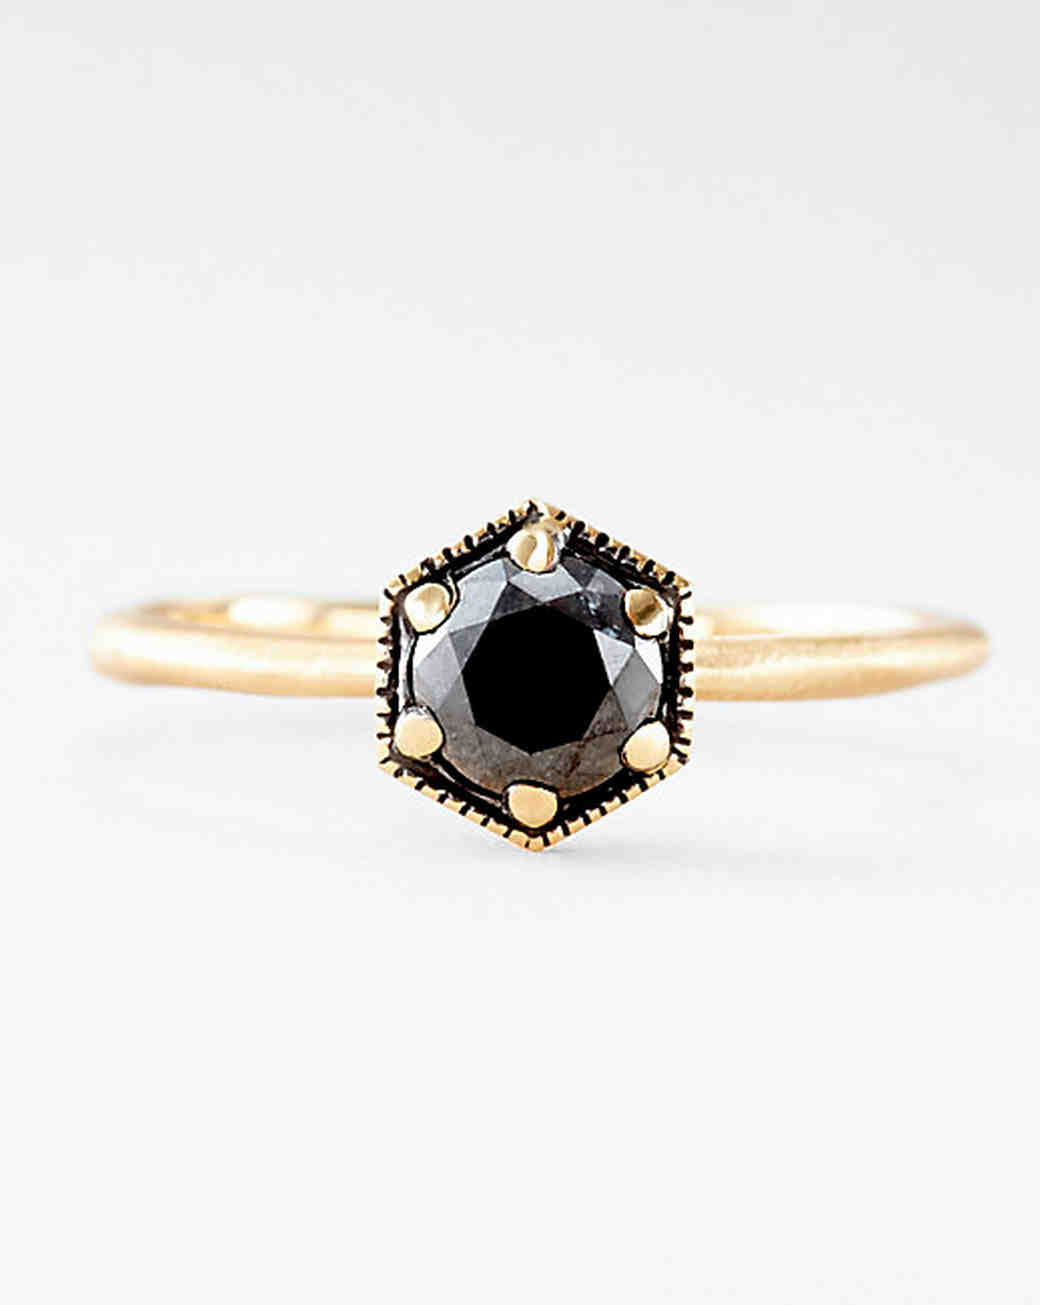 The New Lbd The Little Black Diamond Engagement Ring Martha